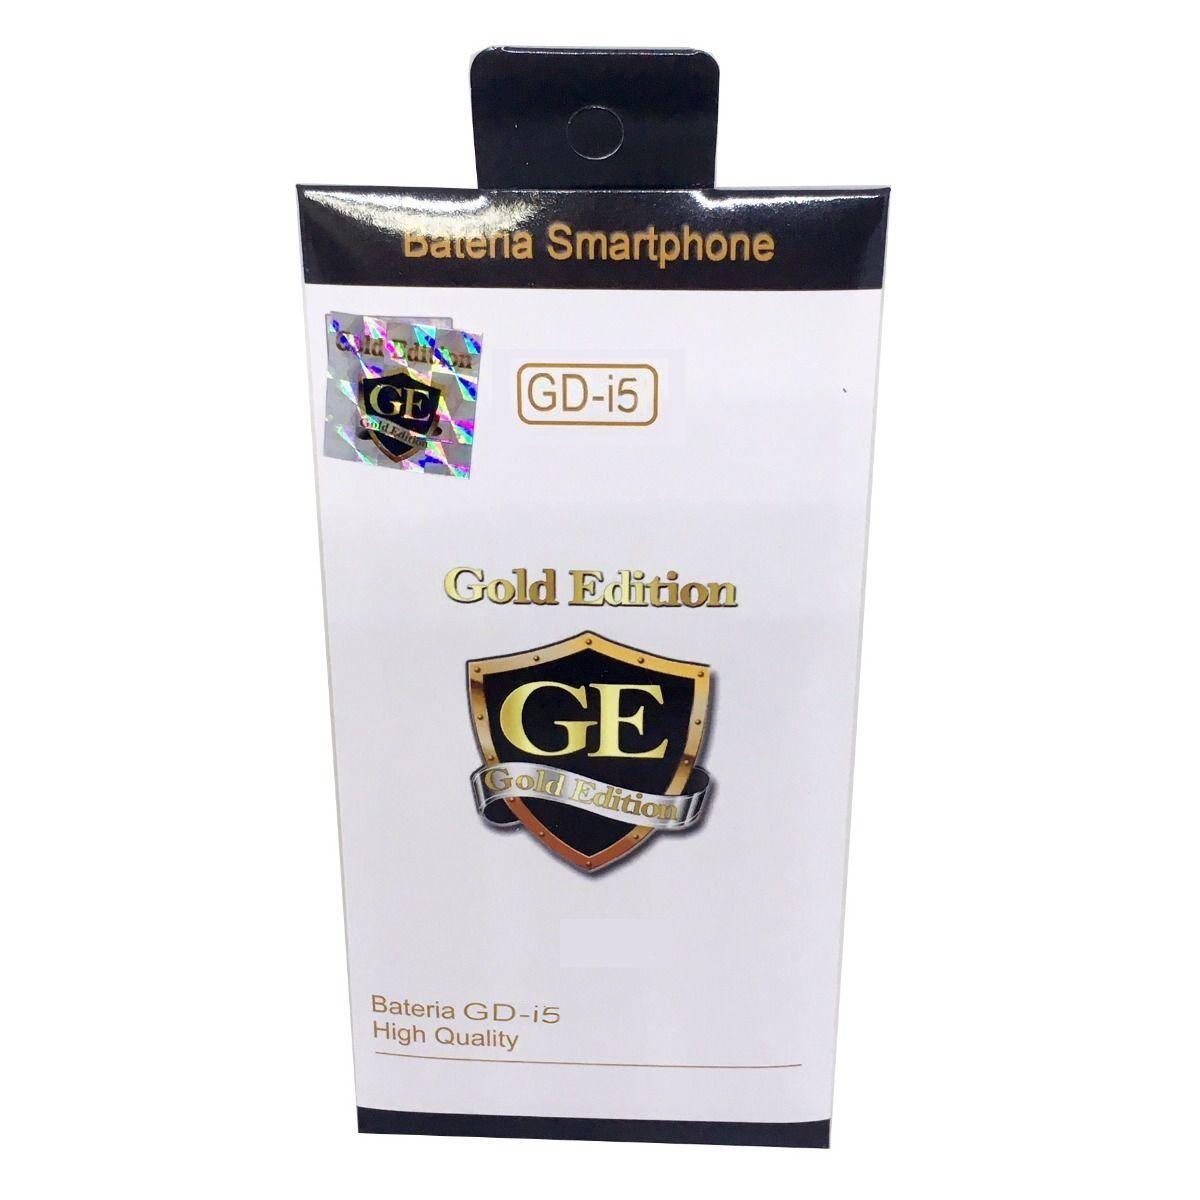 Bateria Para iPhone 5 Gold Edition GD-i5